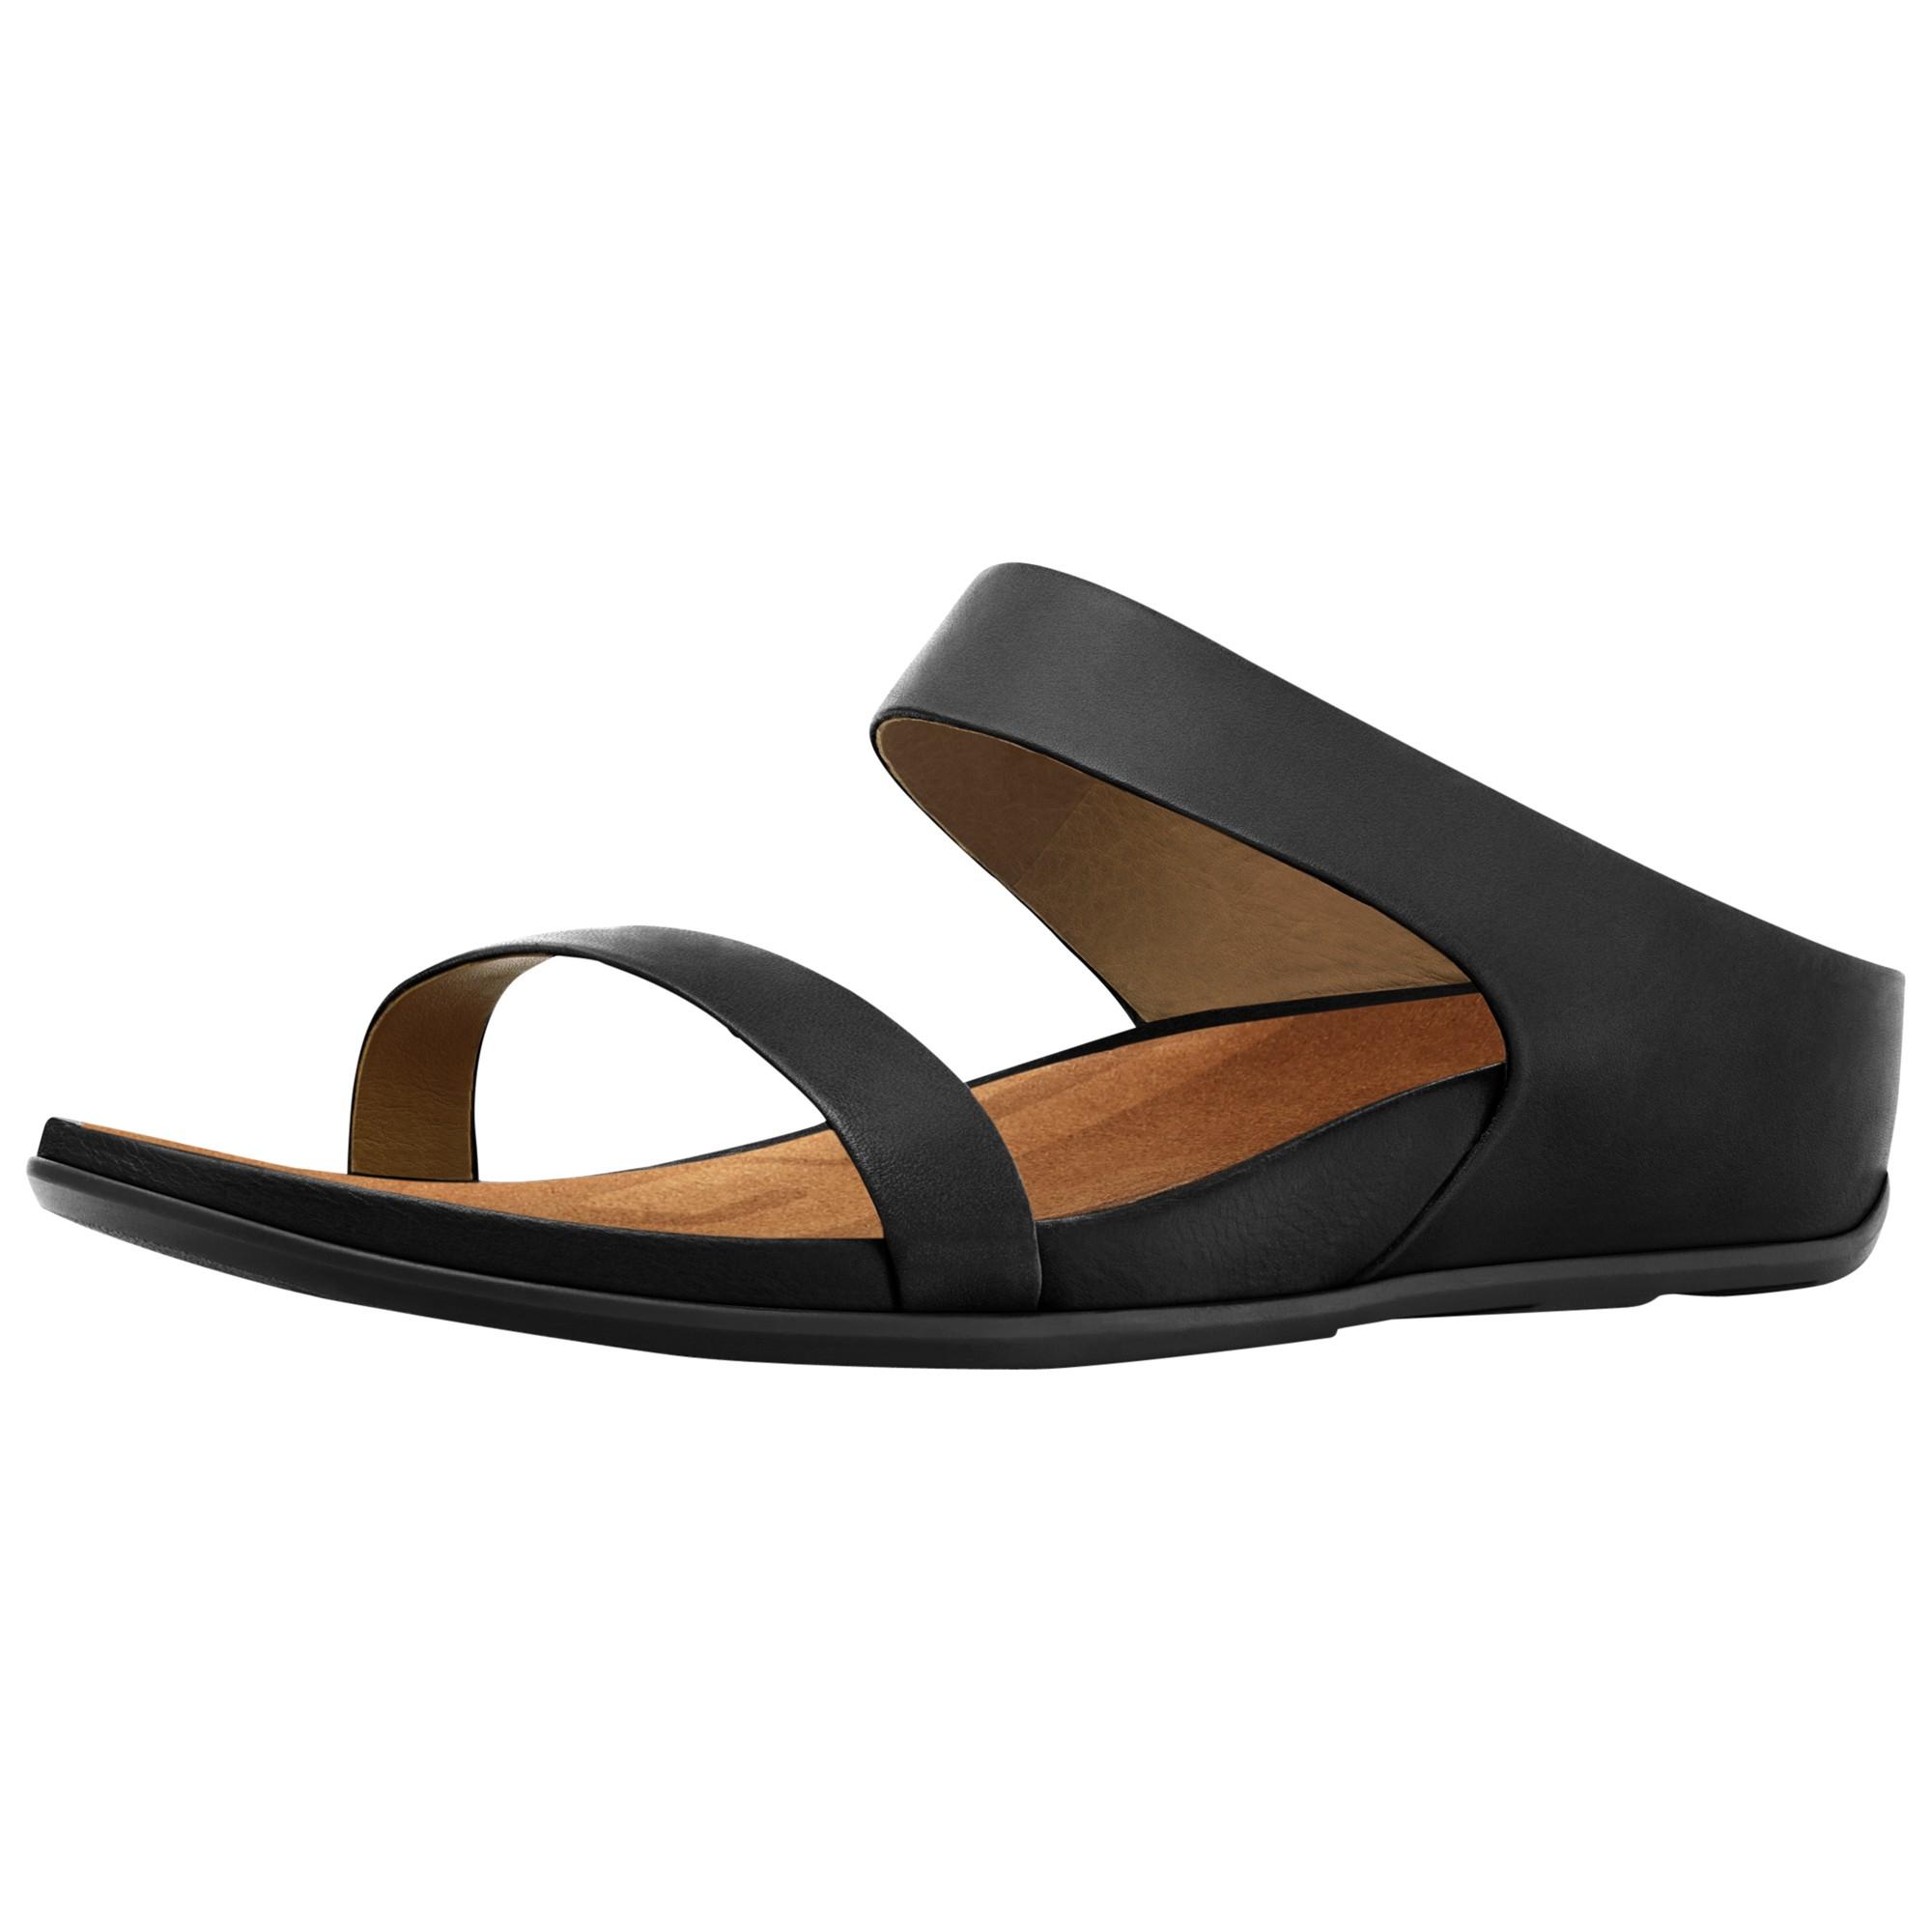 60a374571b00 Fitflop Banda Slide Sandal Black